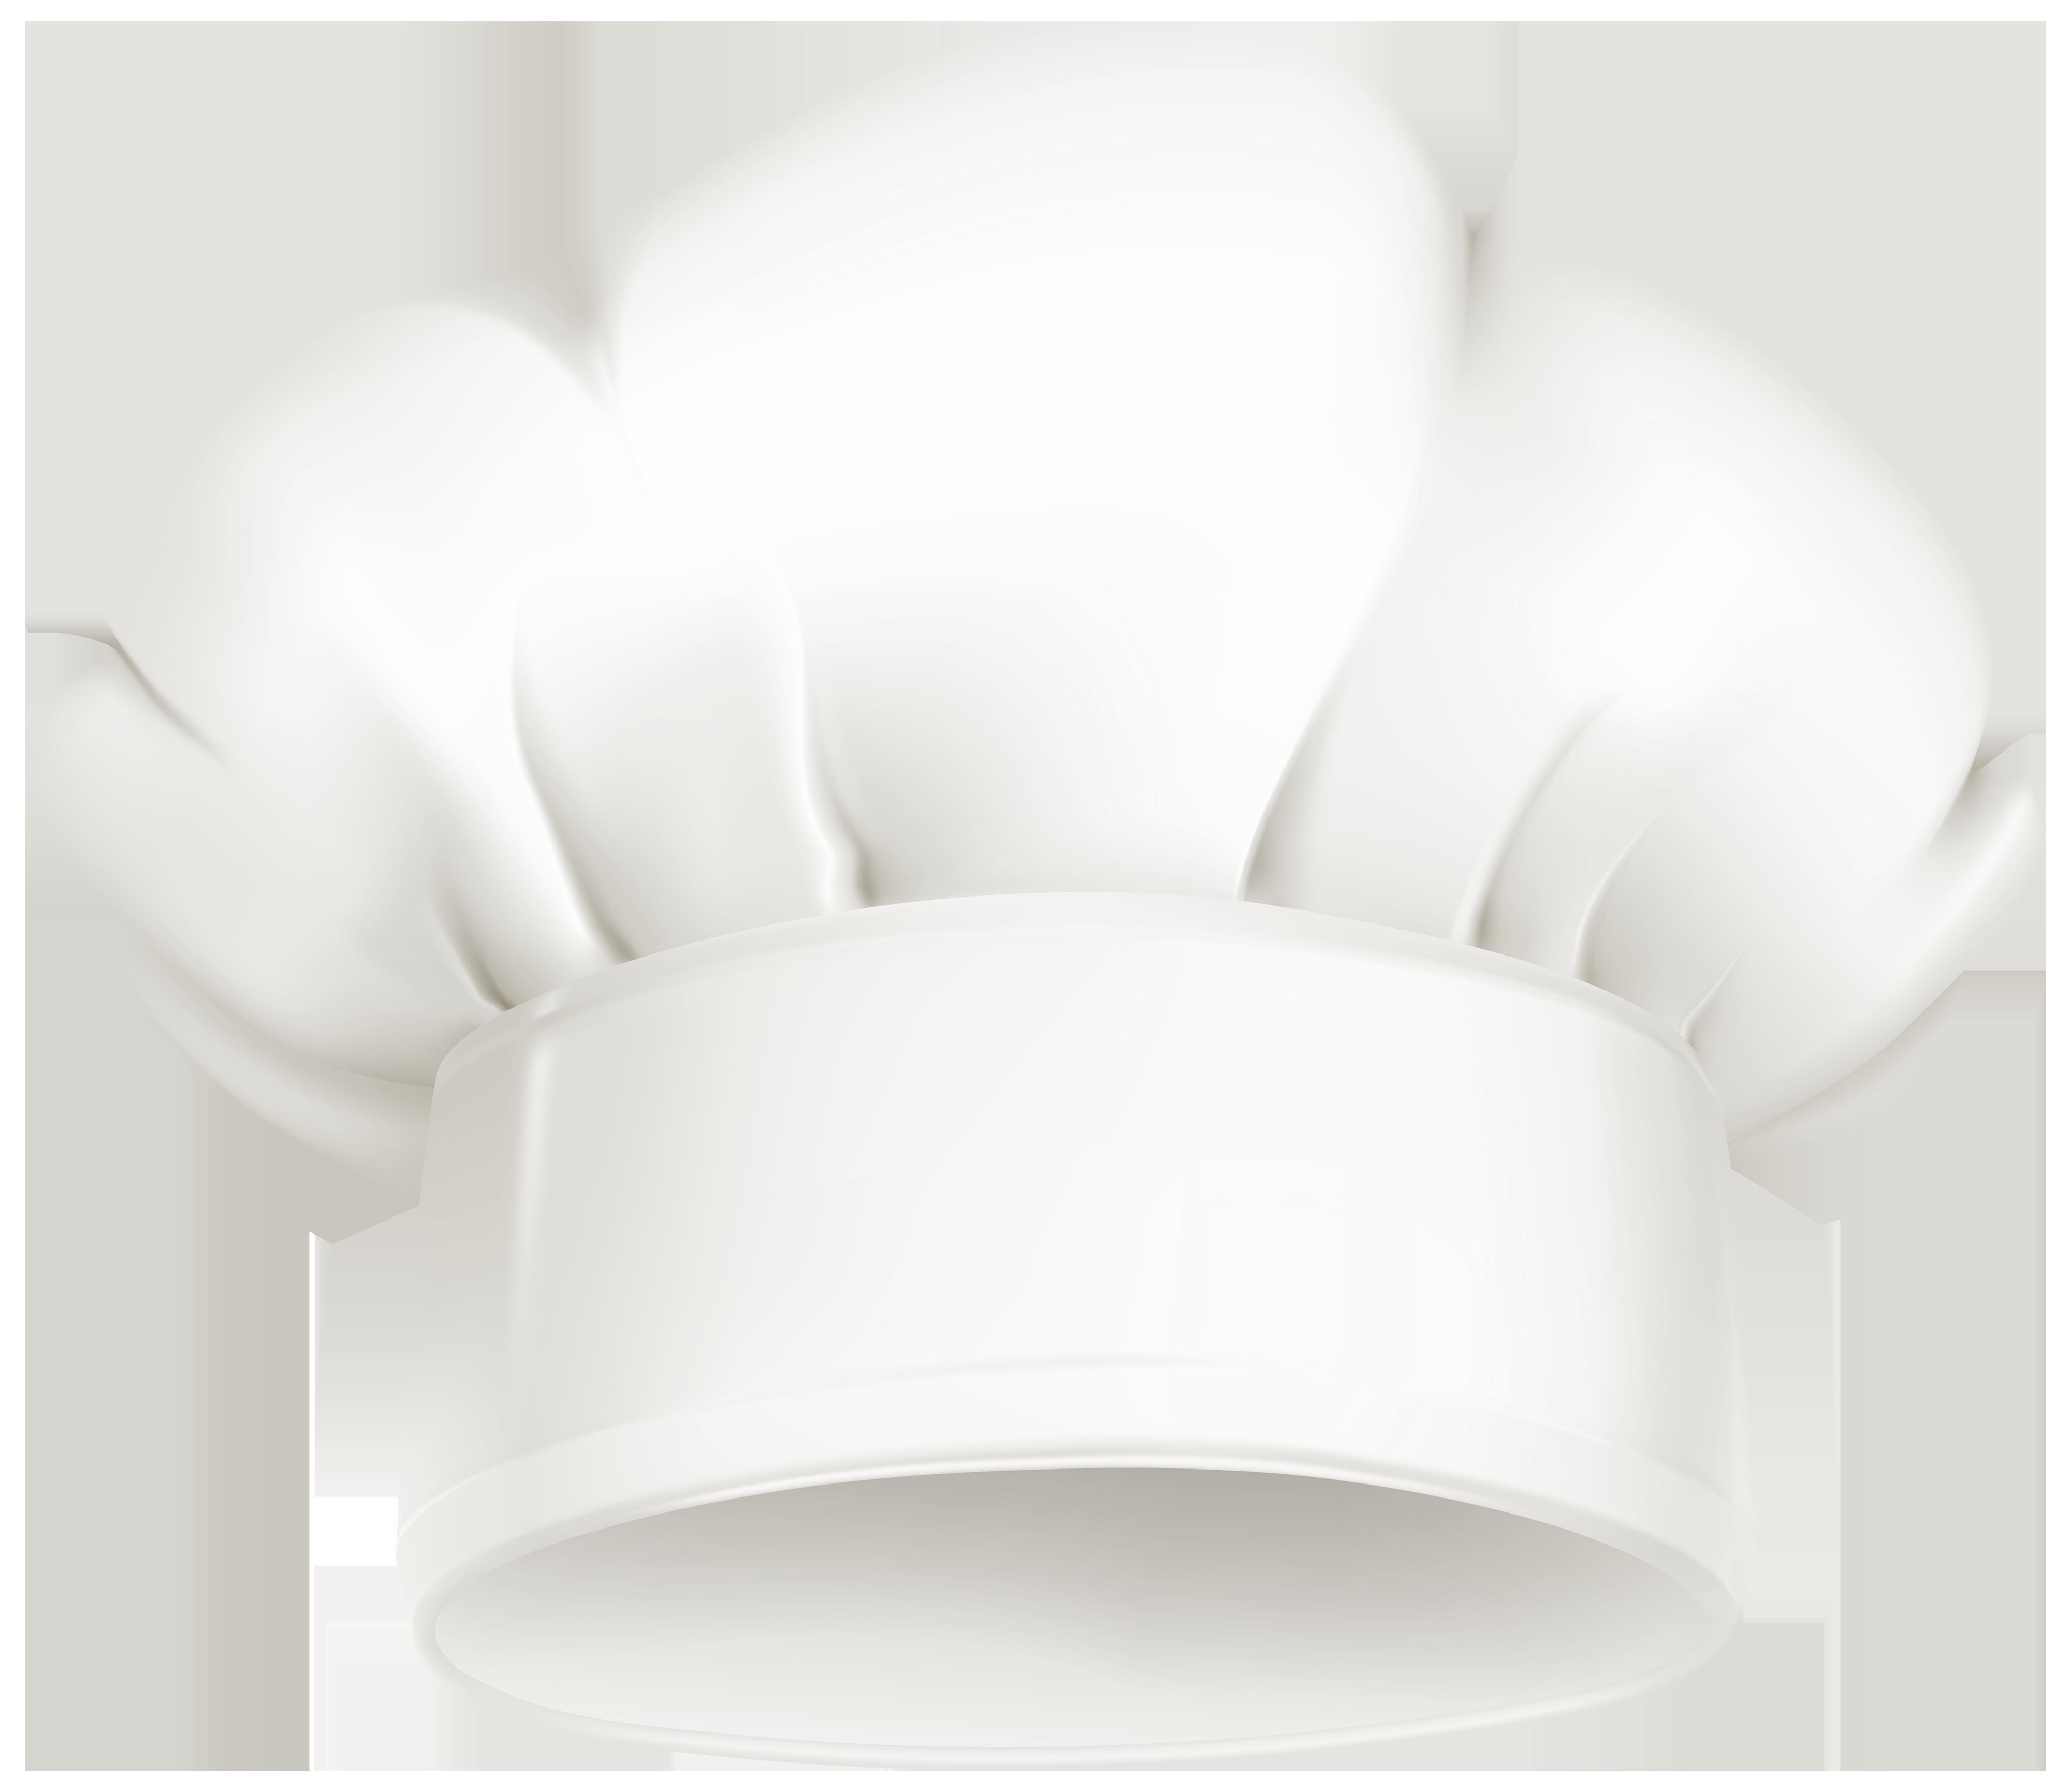 c2a9fafb8ea6e Chef Cap Arts Bakery